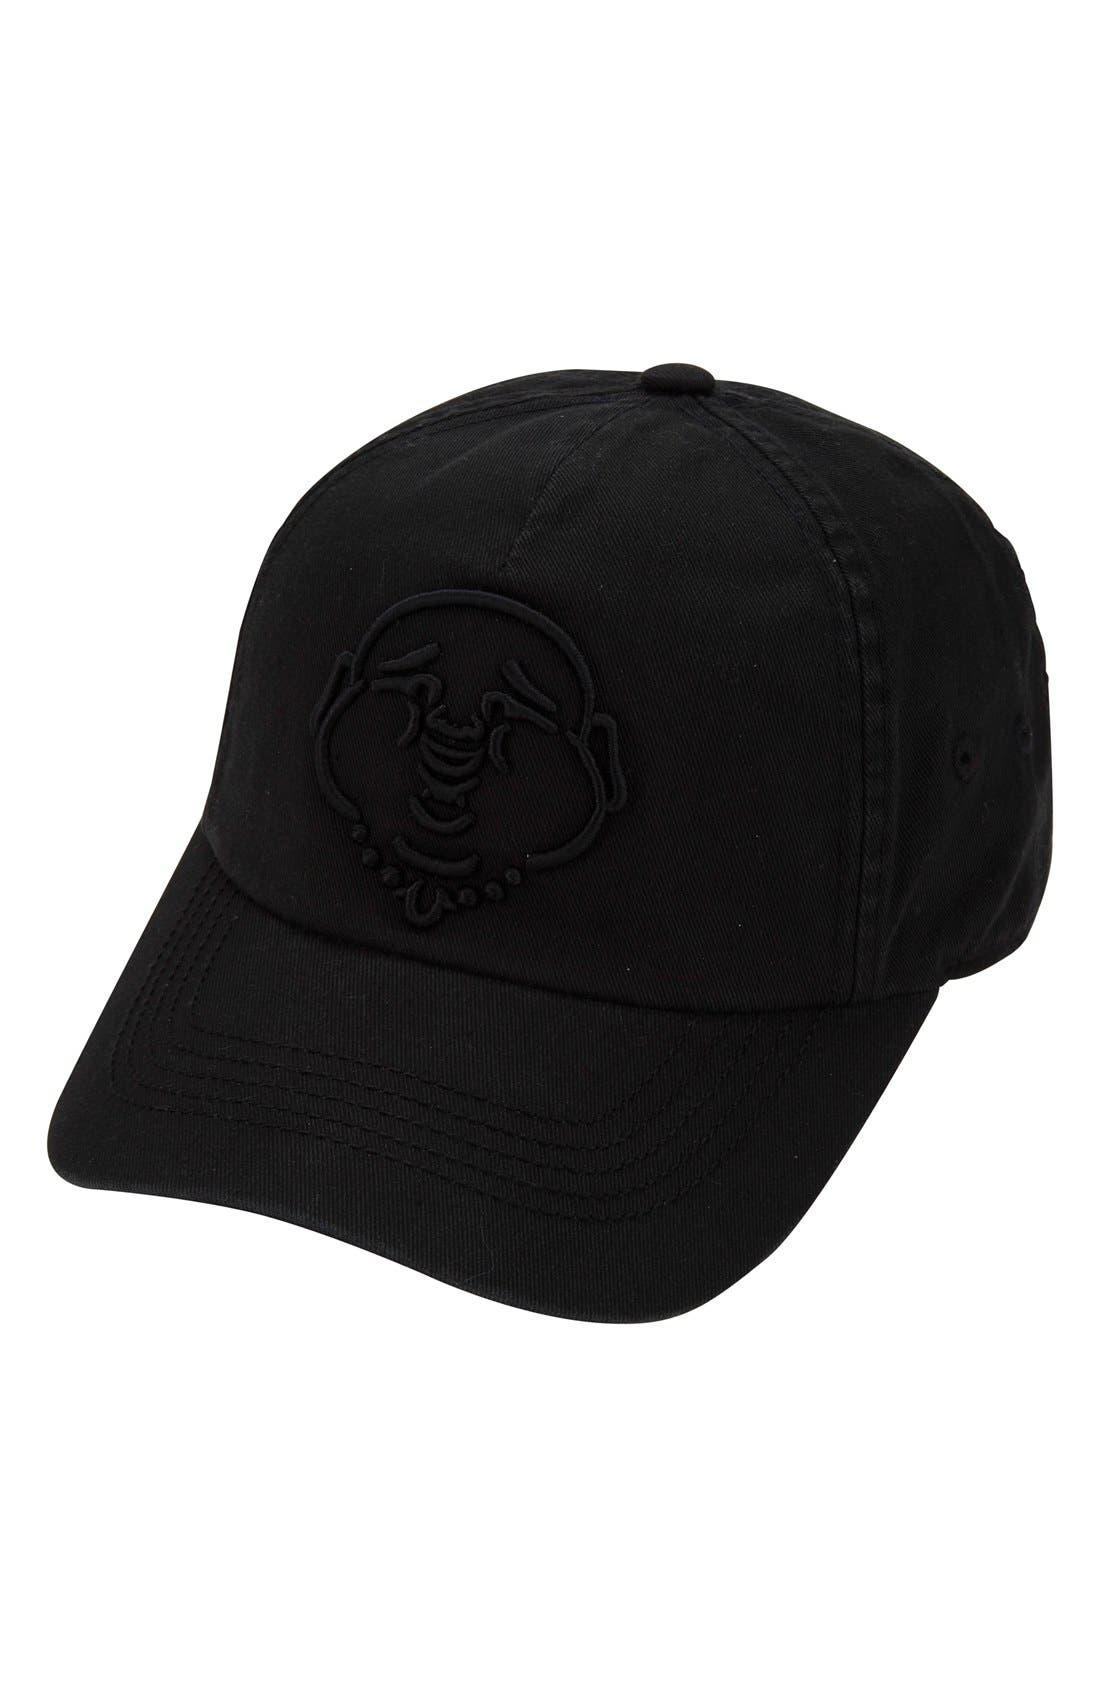 True Religion Brand Jeans '3D Buddha' Baseball Cap